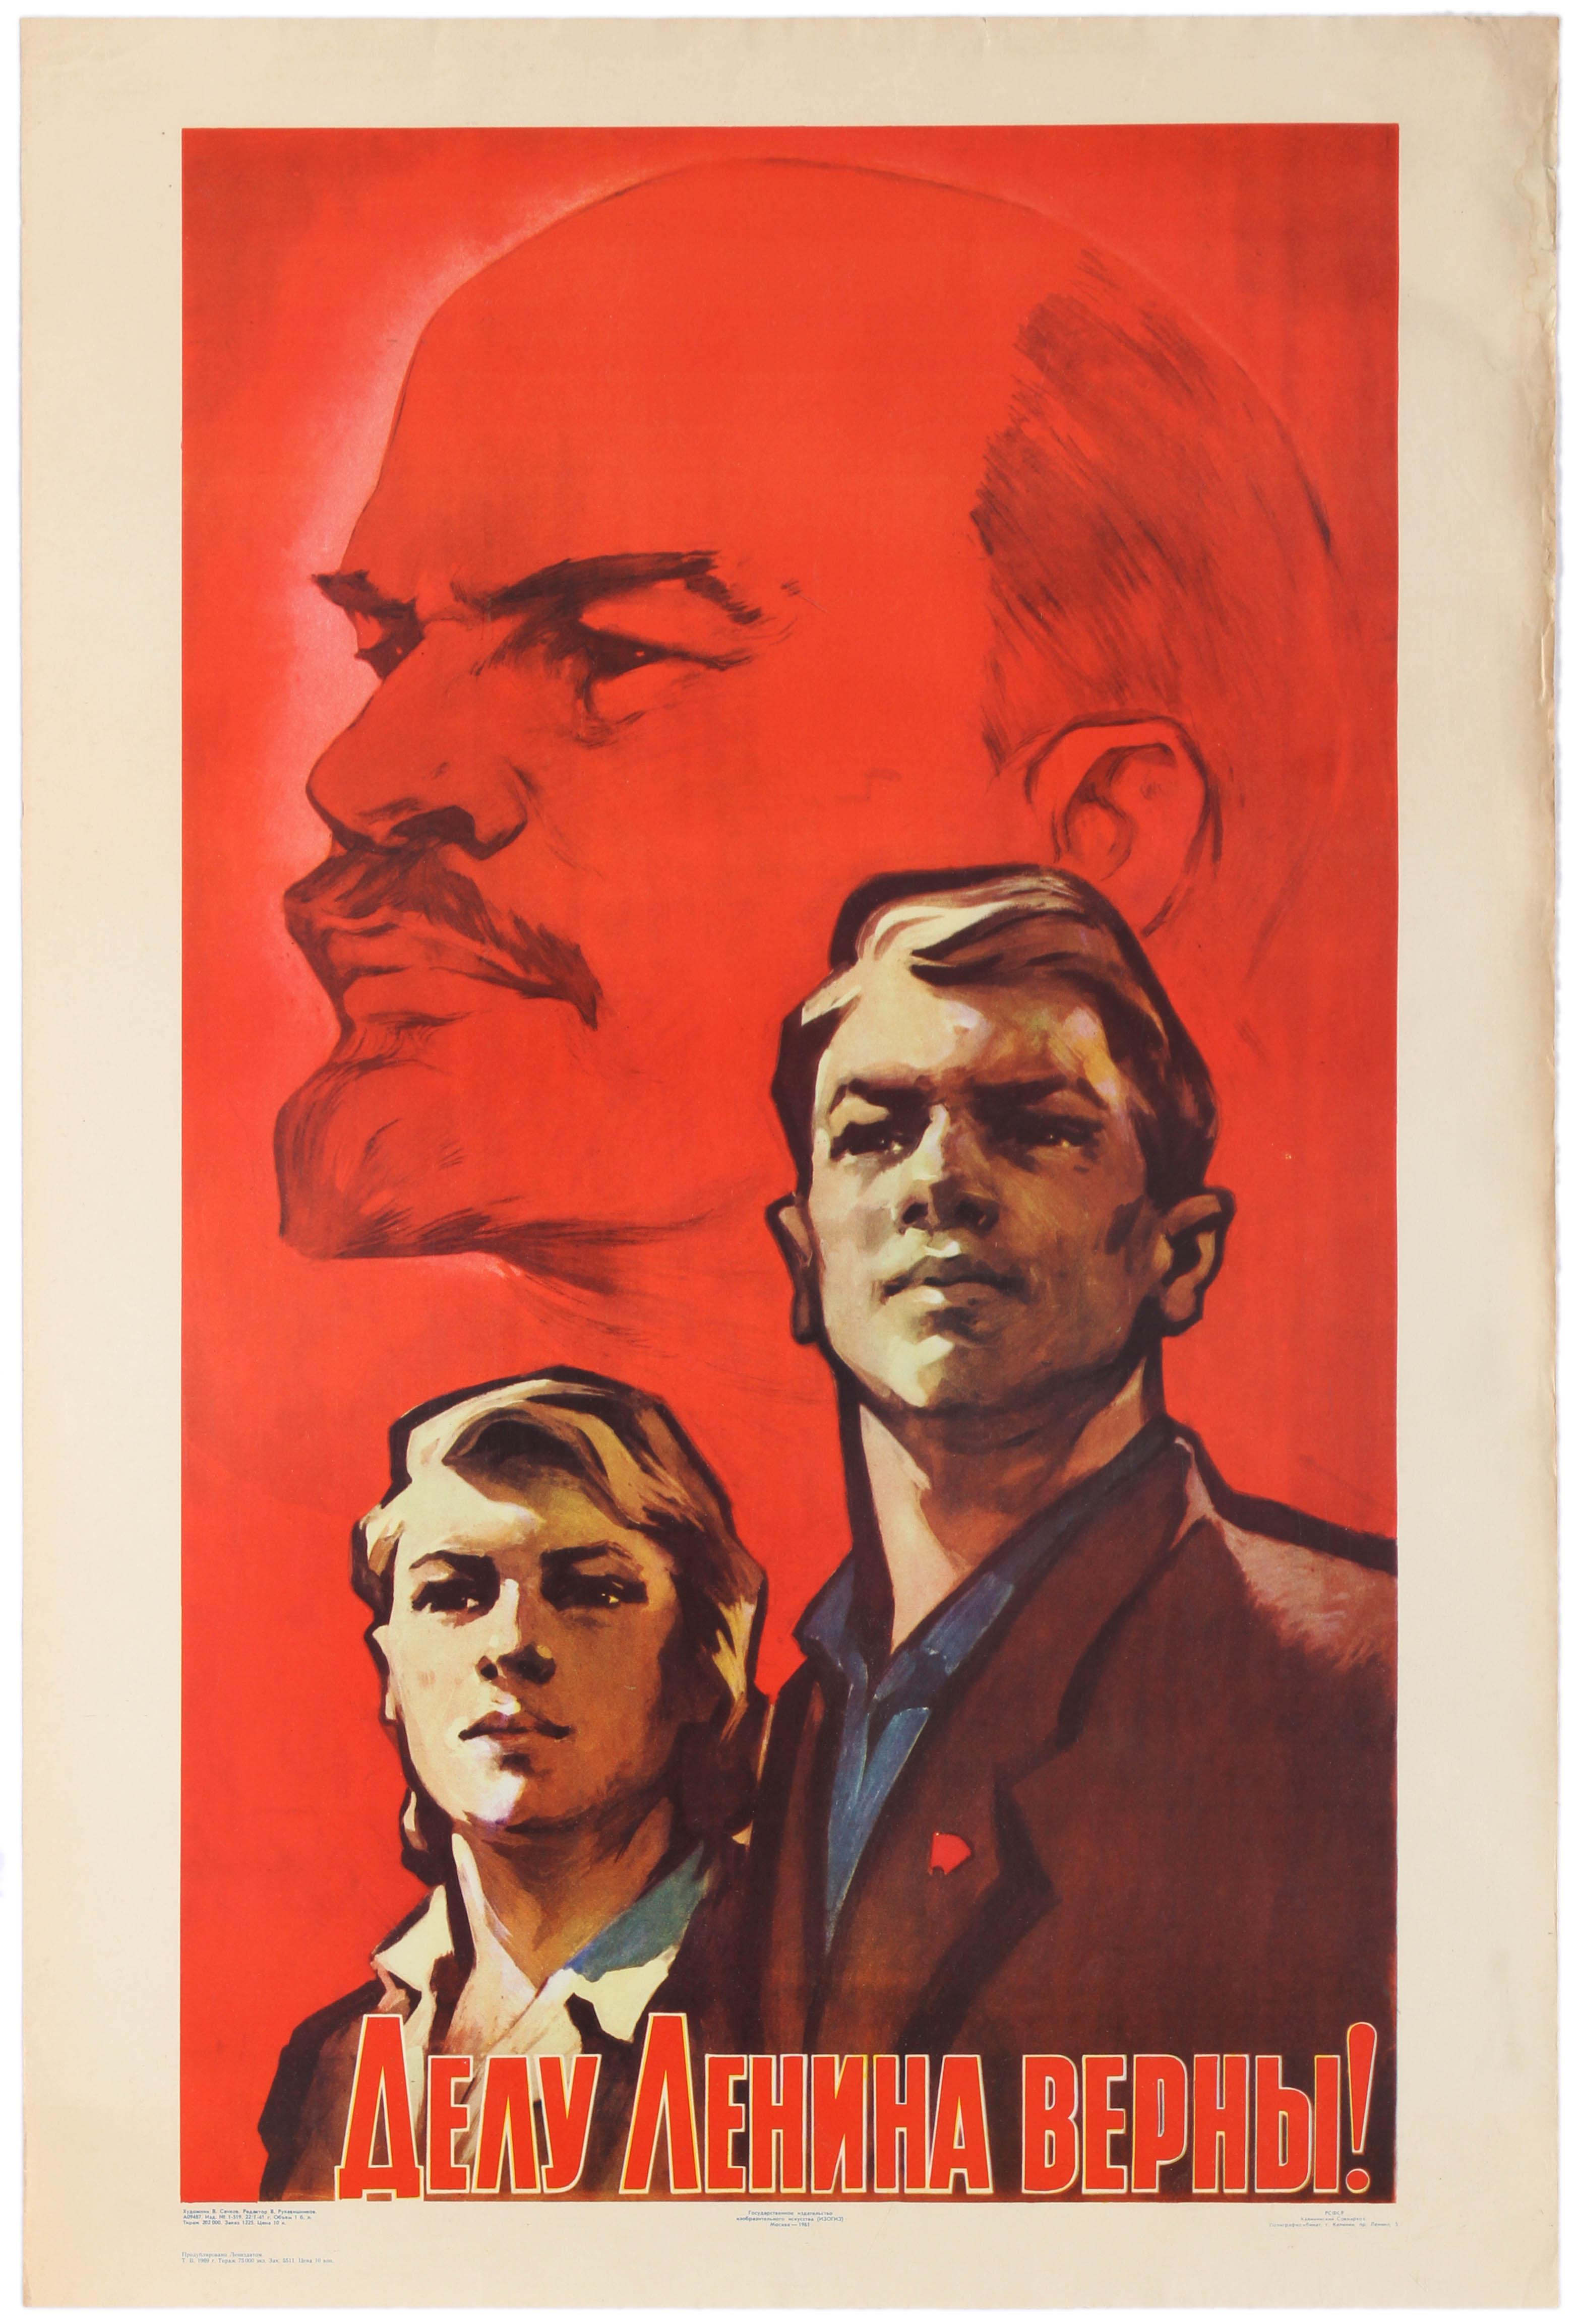 Lot 36 - Propaganda Poster Soviet Union Devoted to Work of Lenin